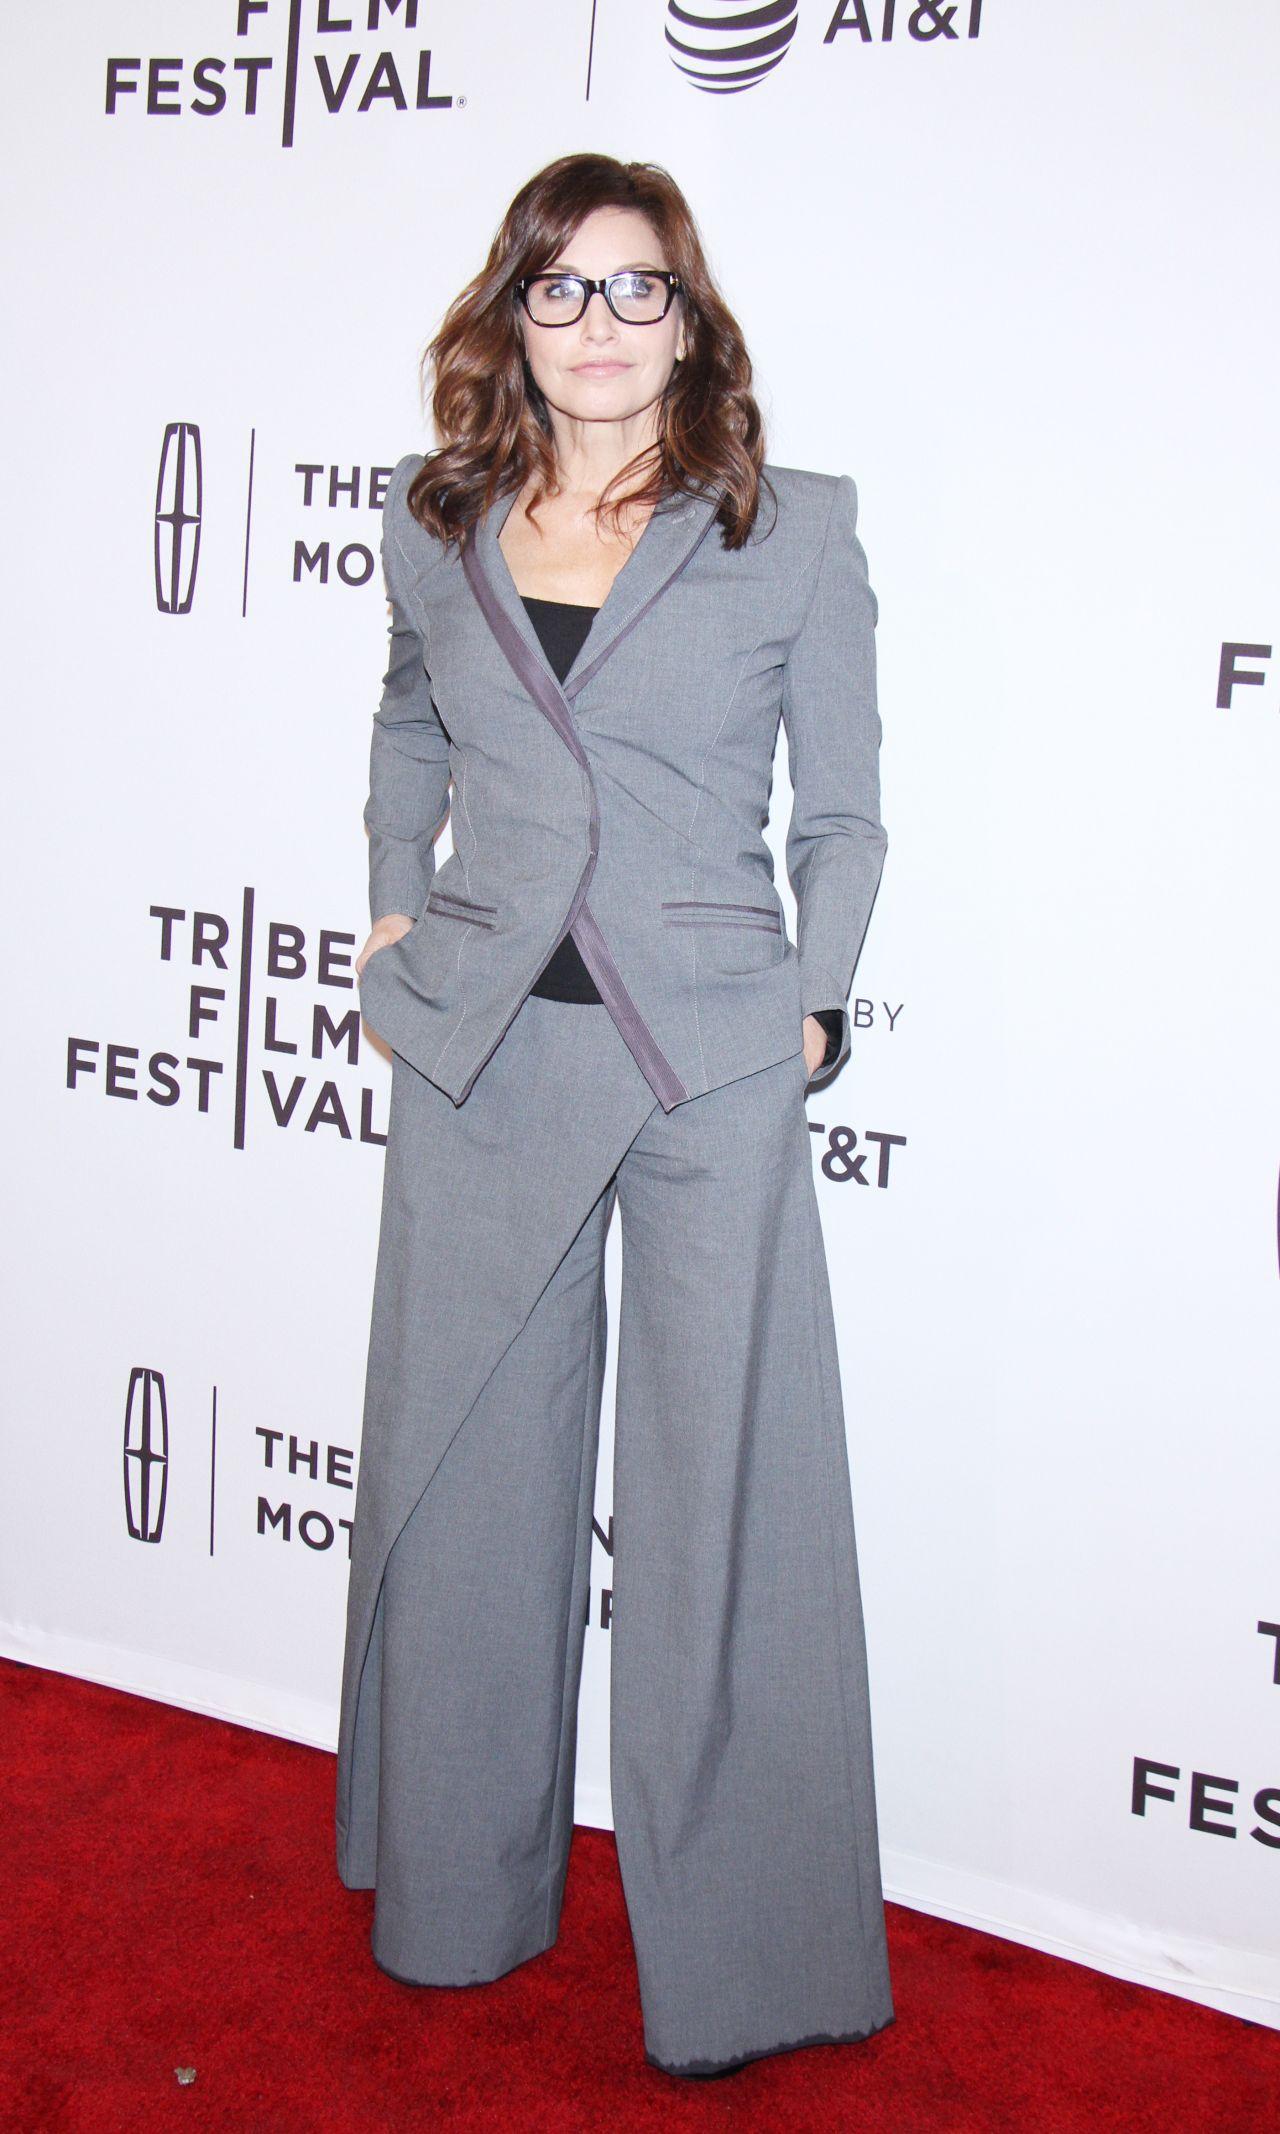 Gina gershon permission screening at tribeca film festival - 2019 year